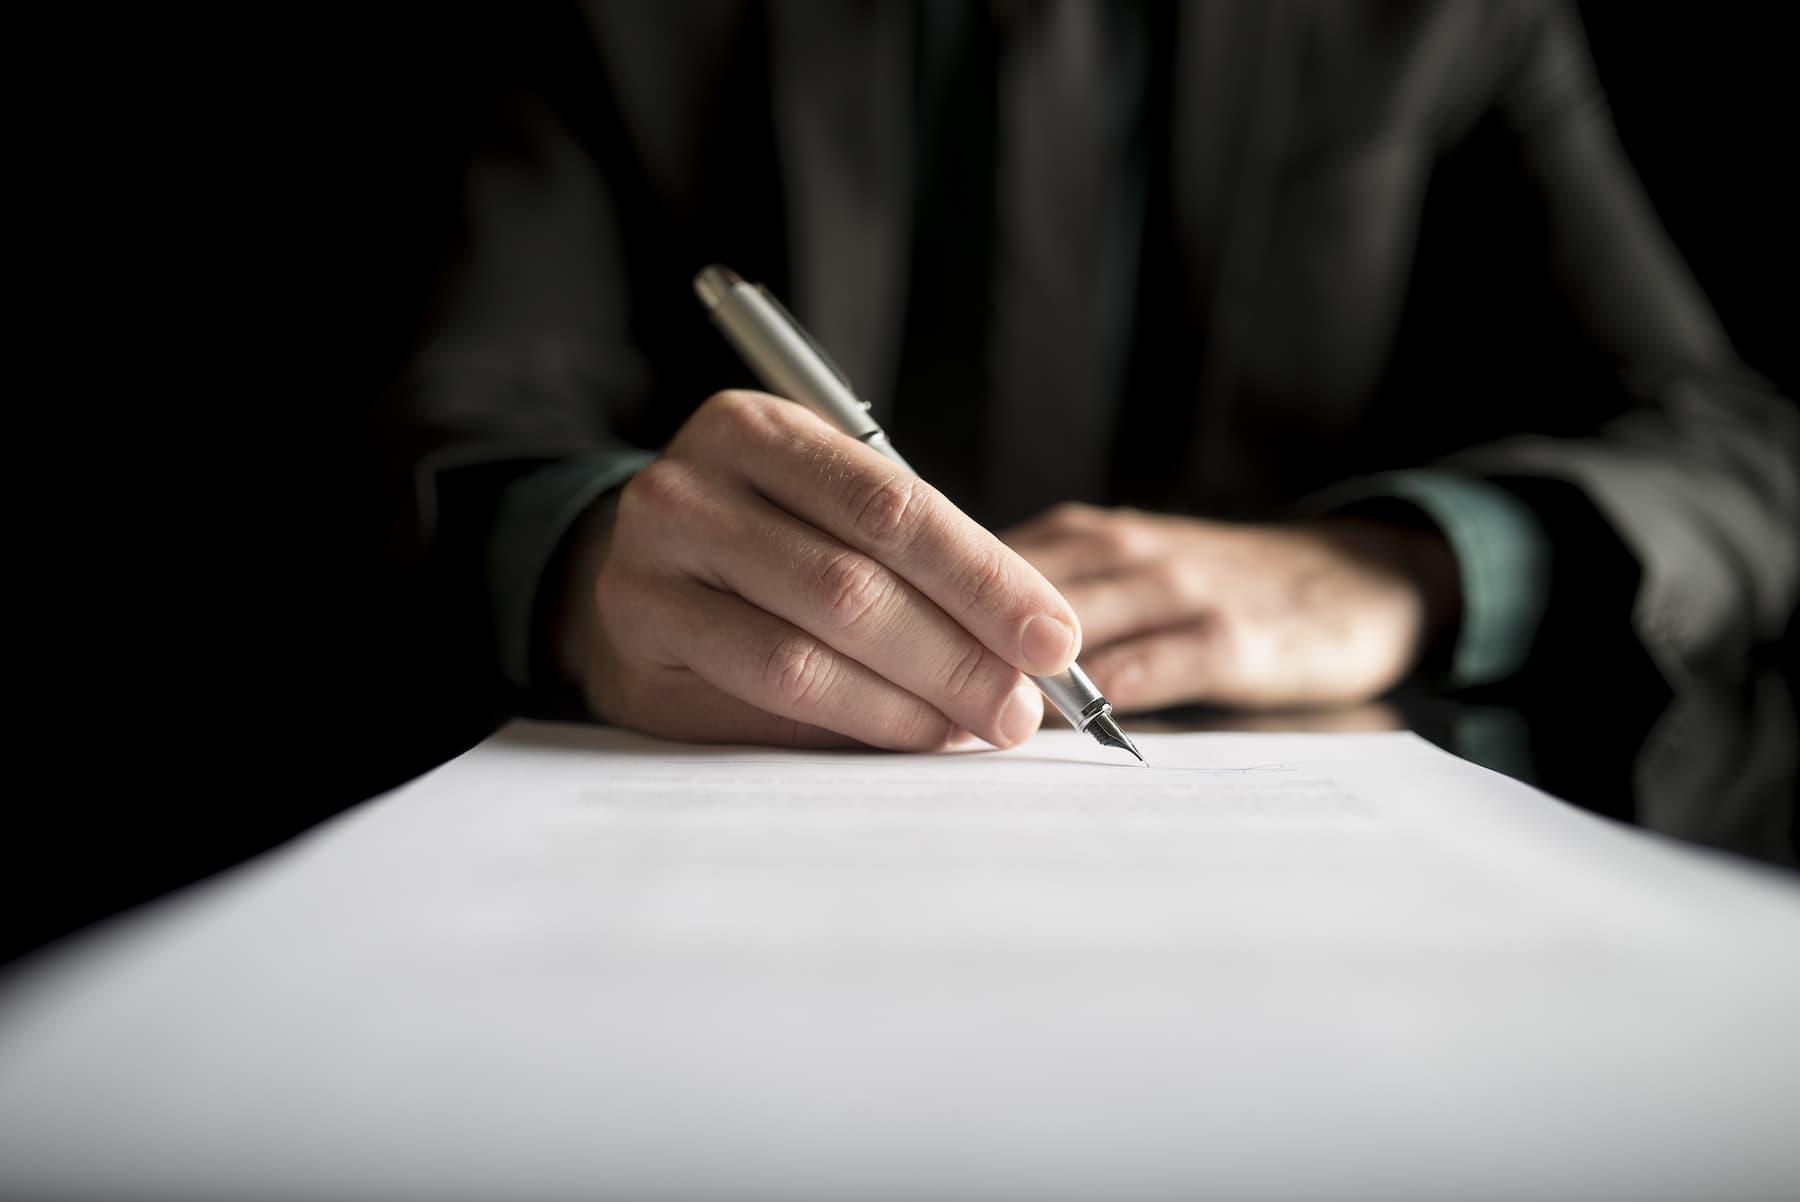 legal-fotos_stock-closeup-of-lawyer-or-executive-signing-a-contract-PK4B783